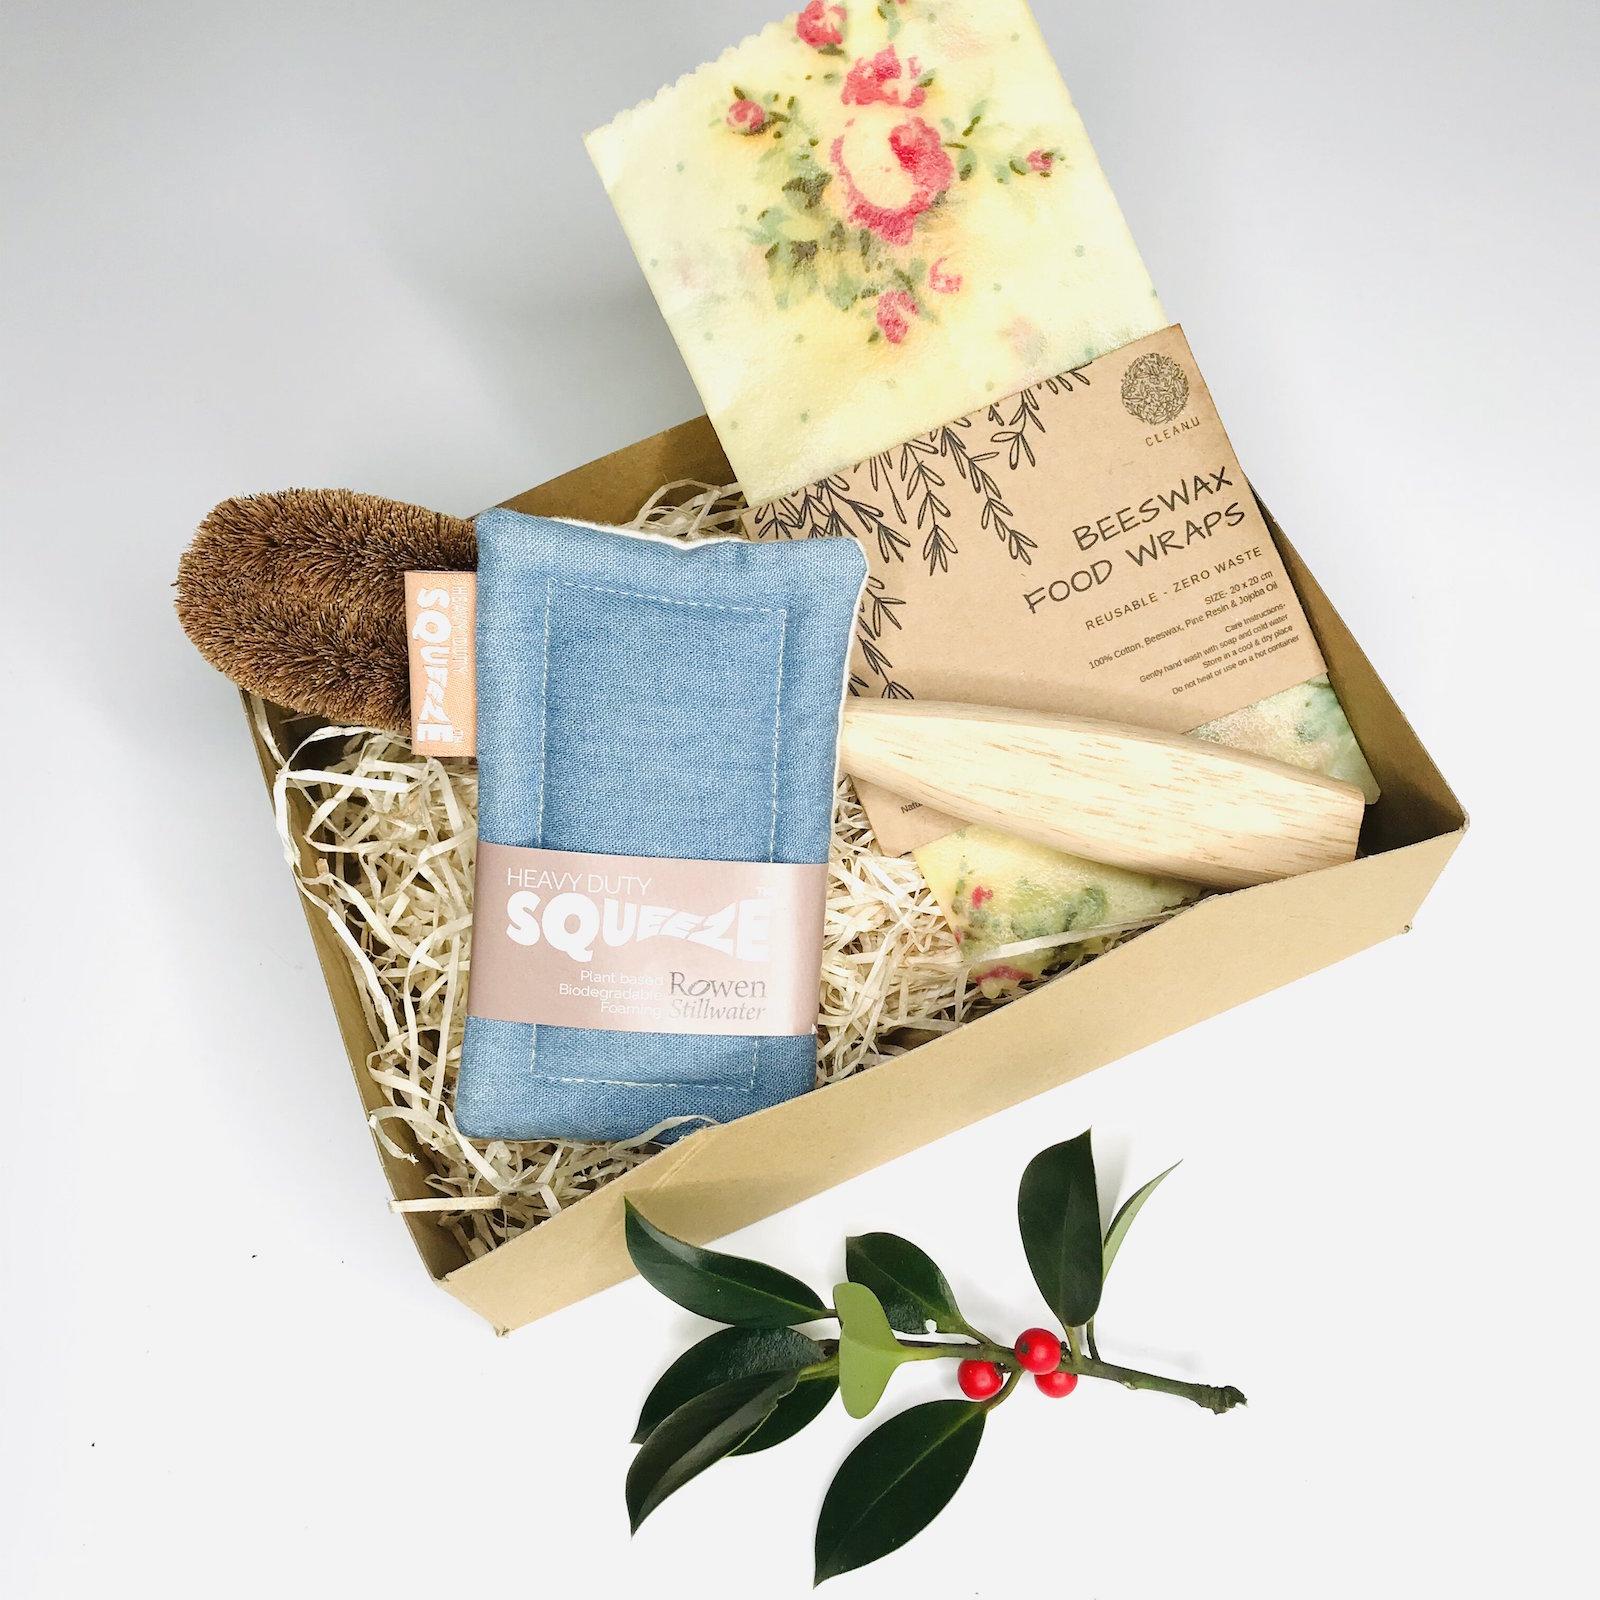 Product image for zero waste kitchen starter kit